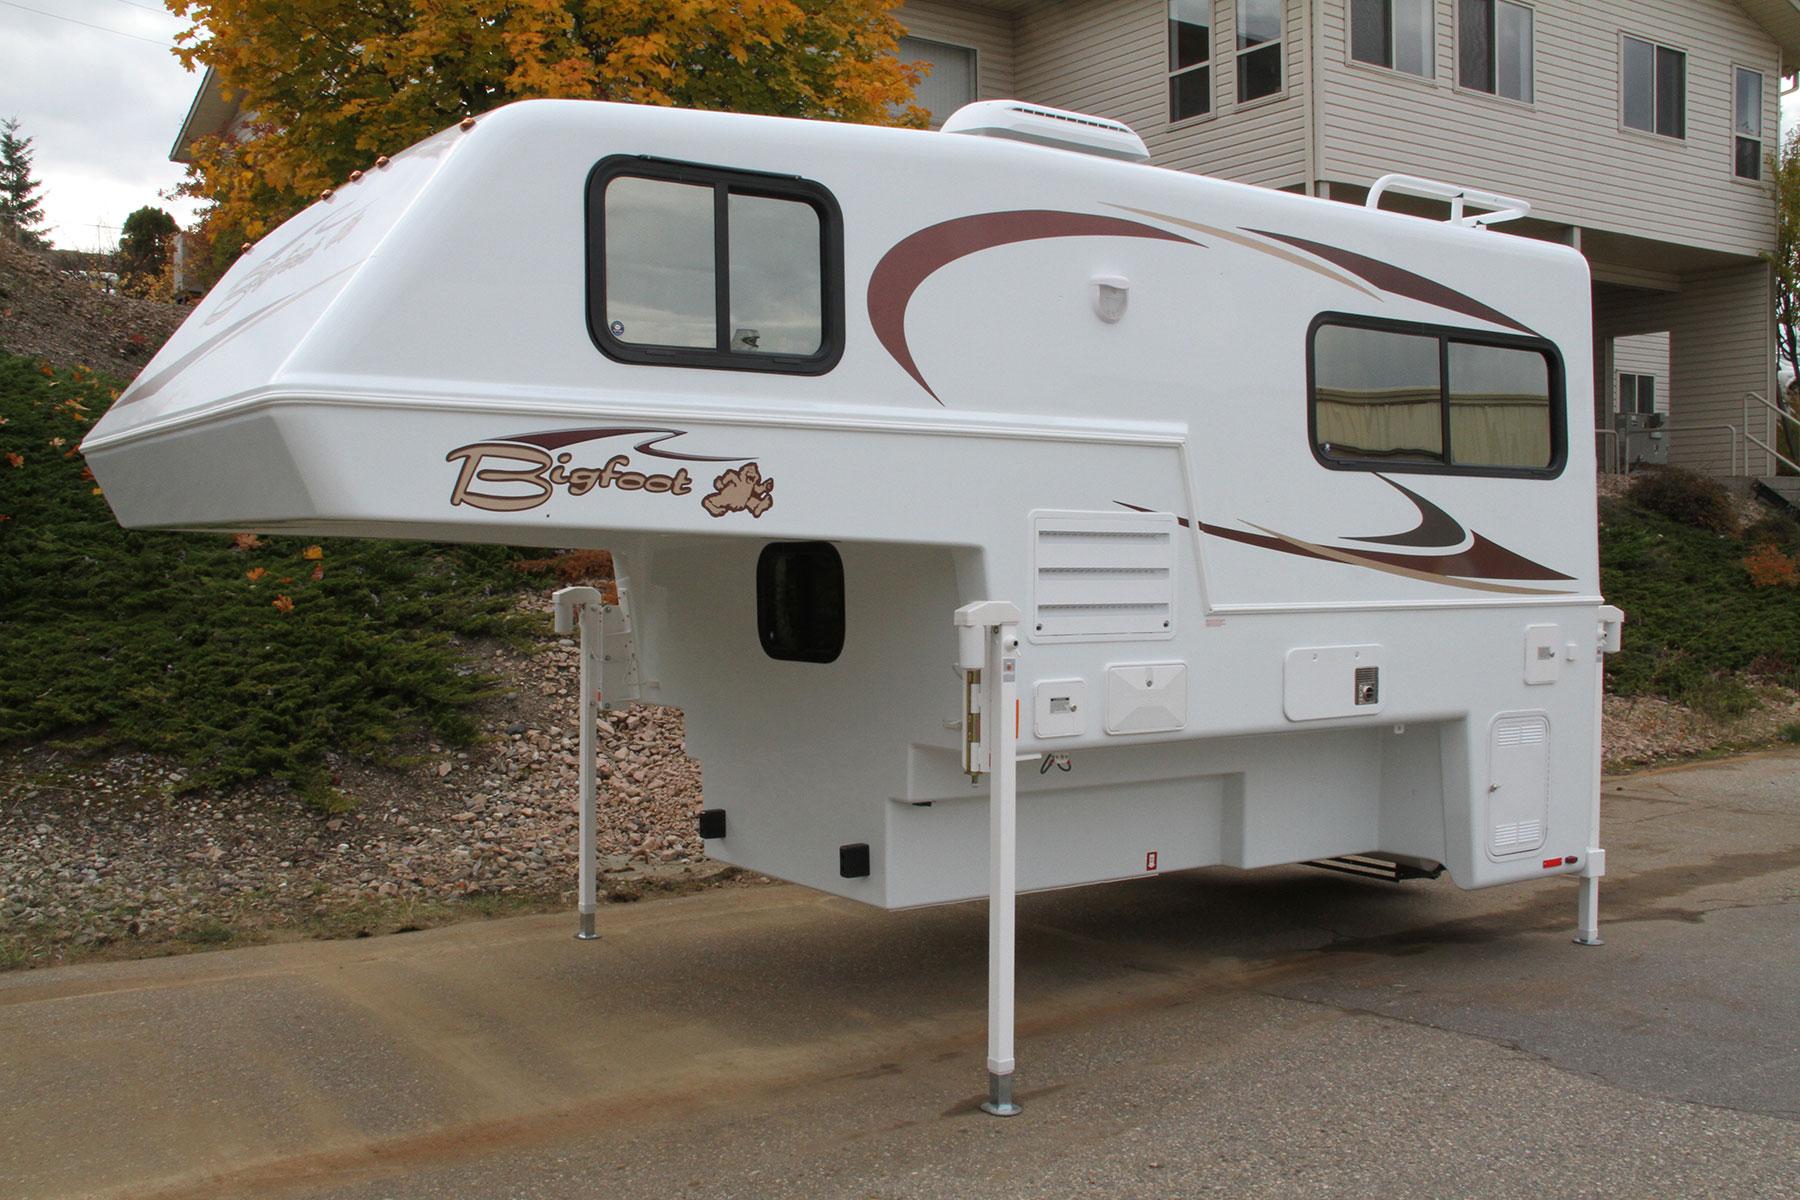 Truck Camper 2500 94 - Exterior View